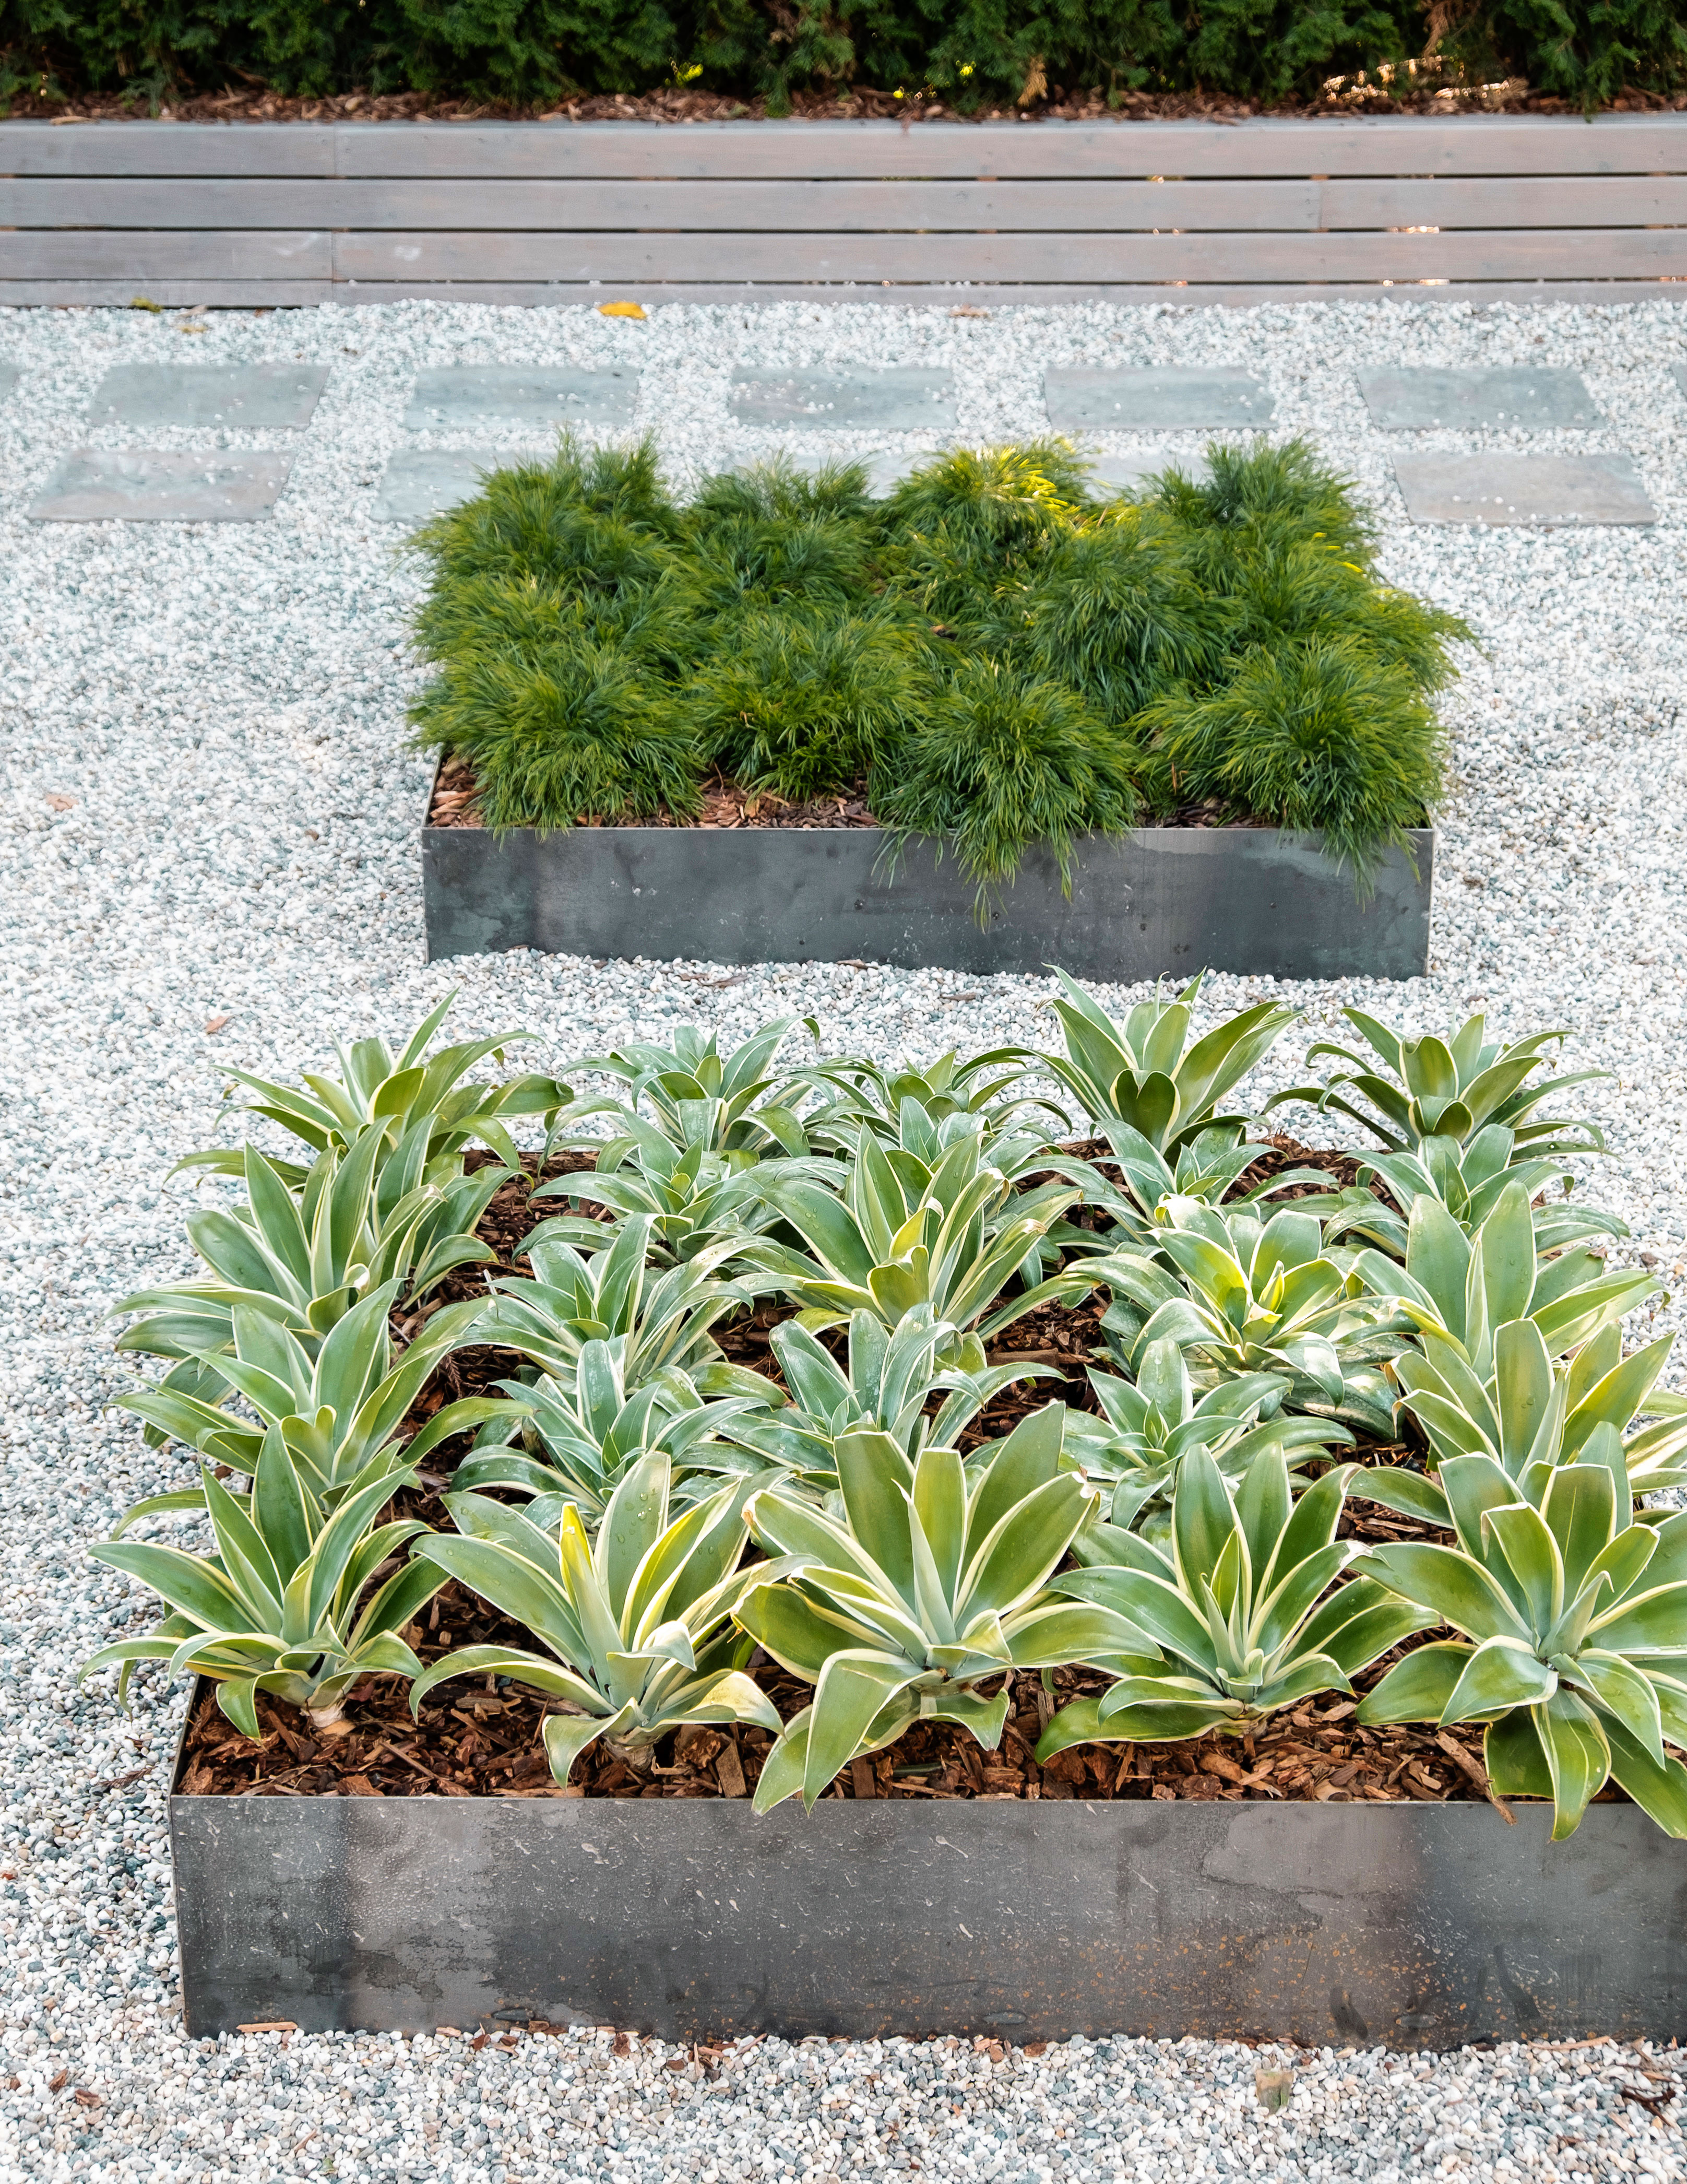 Plant En Masse